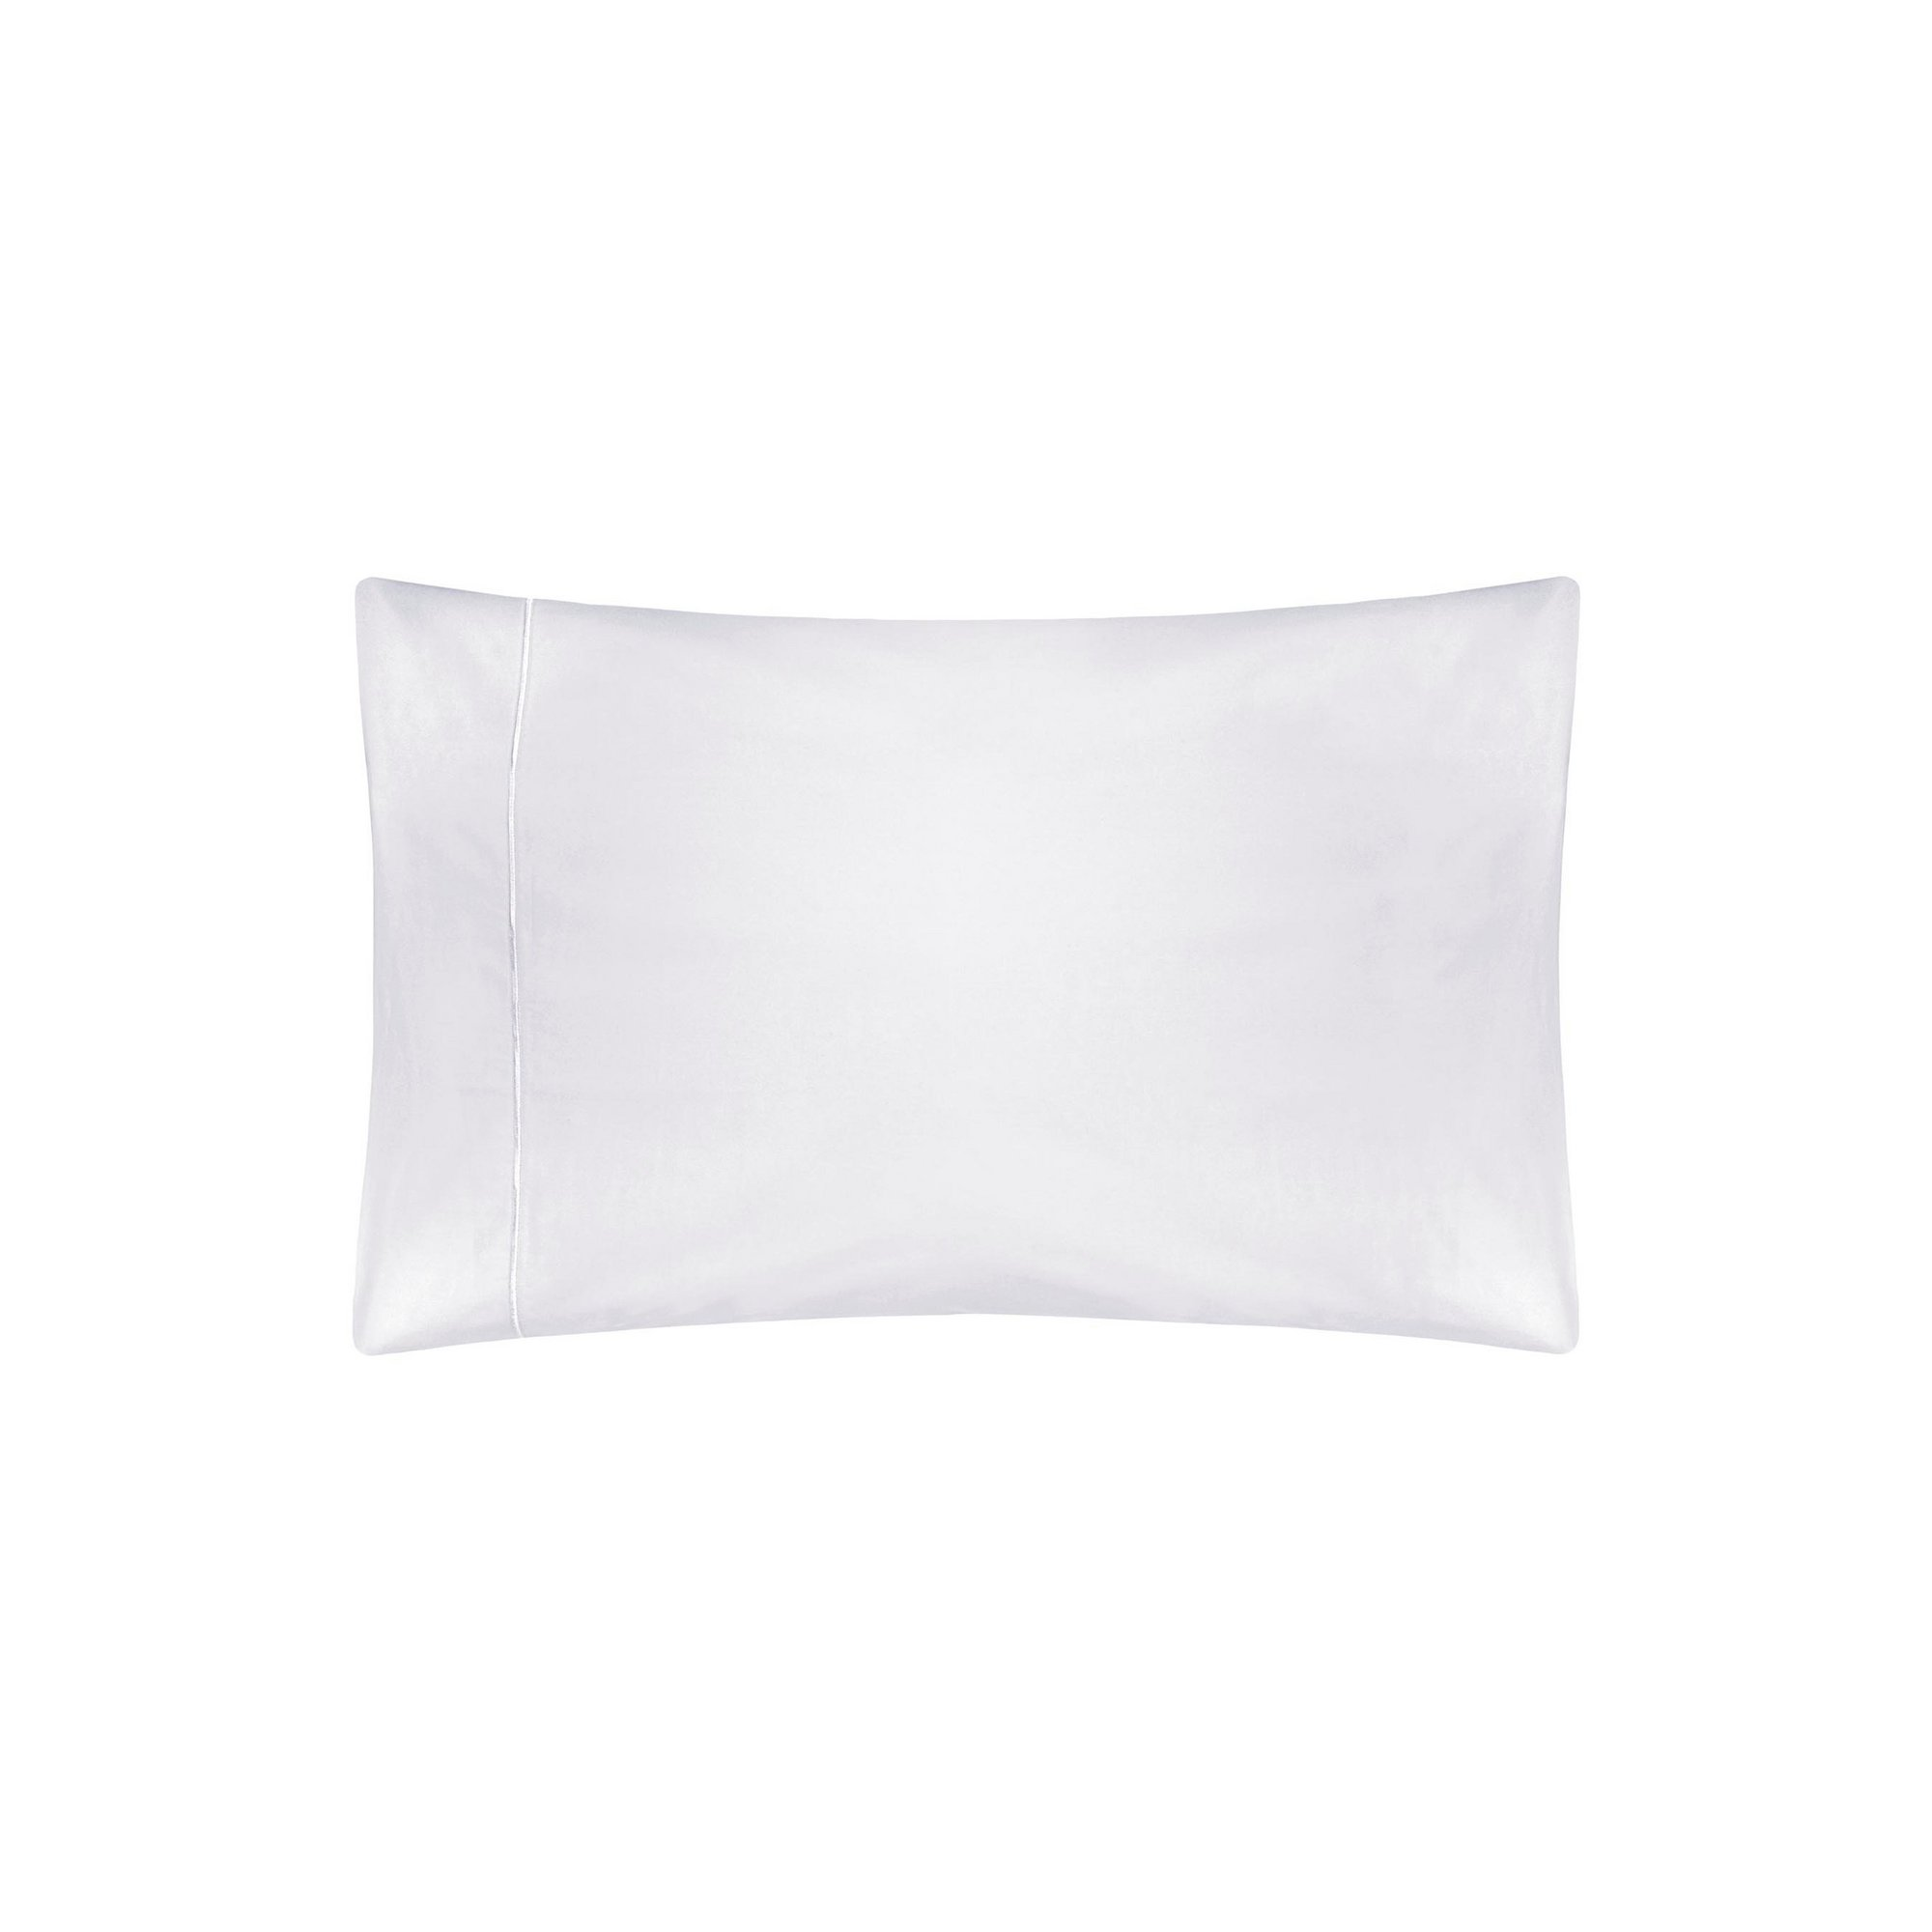 Image of Belledorm Egyptian Cotton Plain Hem Pillowcase